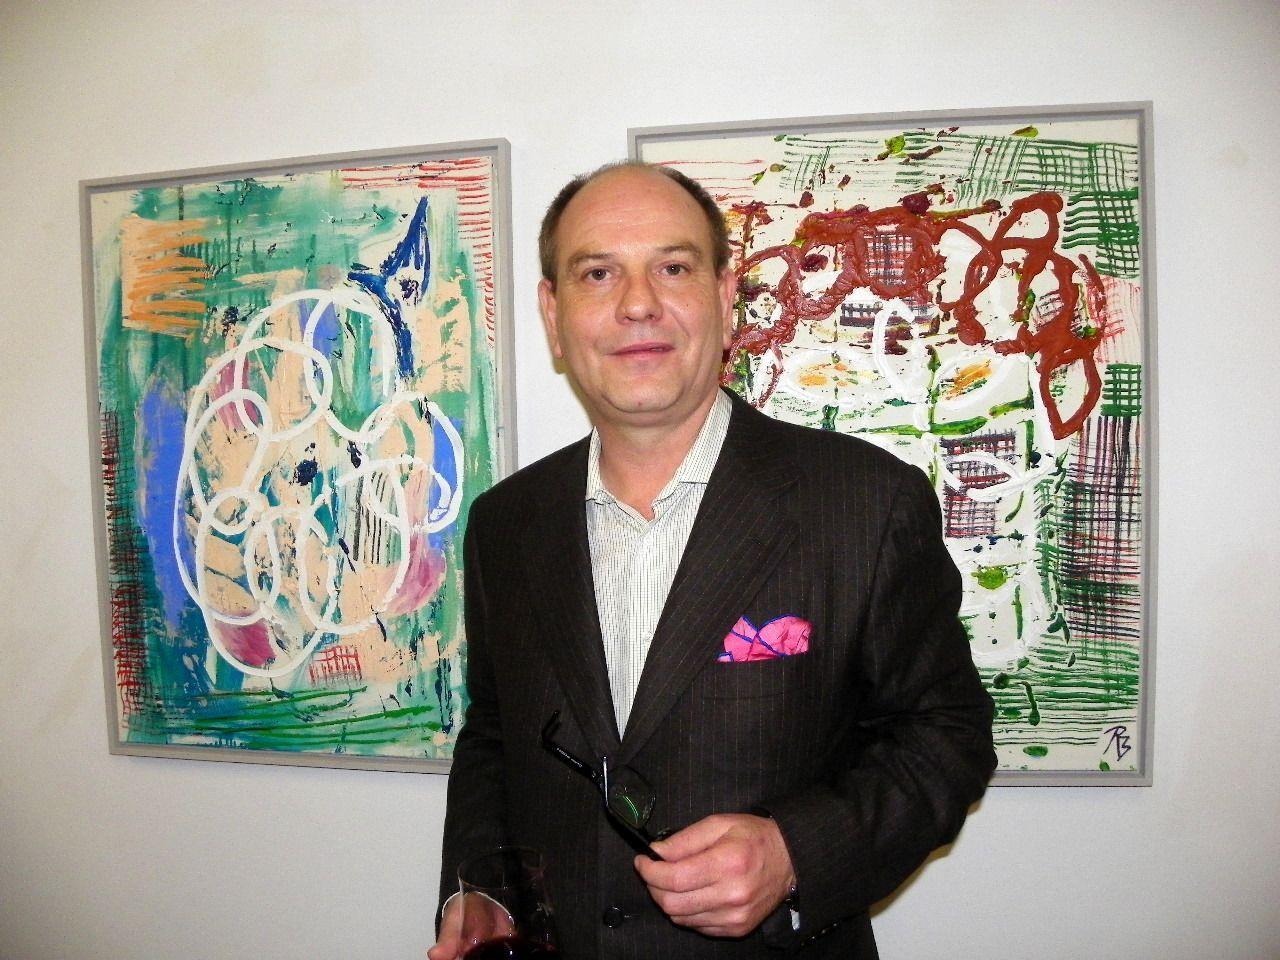 Künstler Reinhold Braun